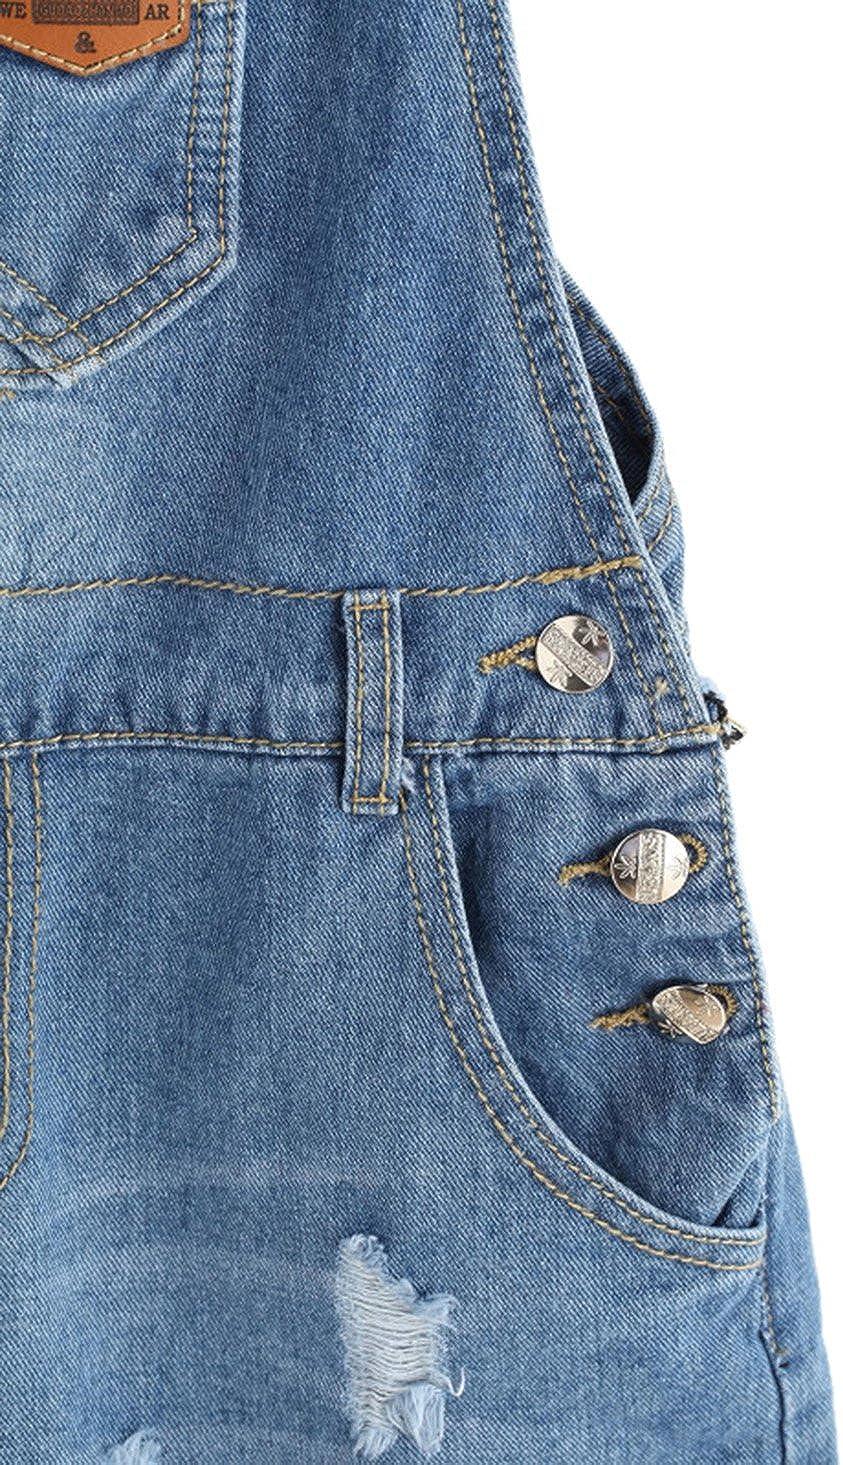 MAKEMECHIC Womens Ripped Distressed Denim Overall Shorts Romper